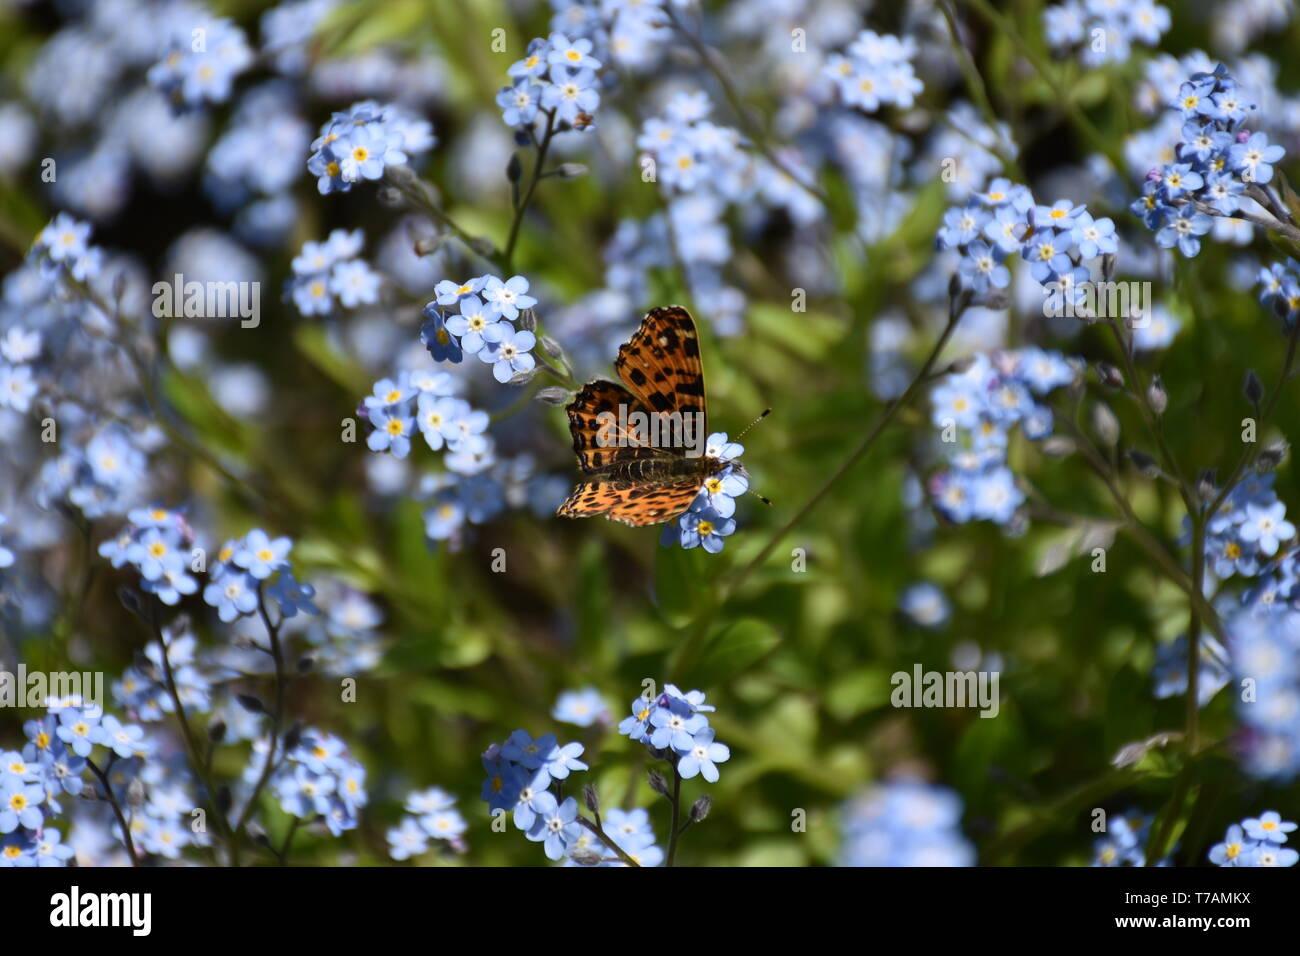 Vanessa cardui, Distelfalter, Edelfalter, Falter, Saugrüssel, Rüssel, Schmetterling, Lepidoptera, Flügel, Muster, Blume, Blüte, Blumen, Blüten, Wiesen - Stock Image